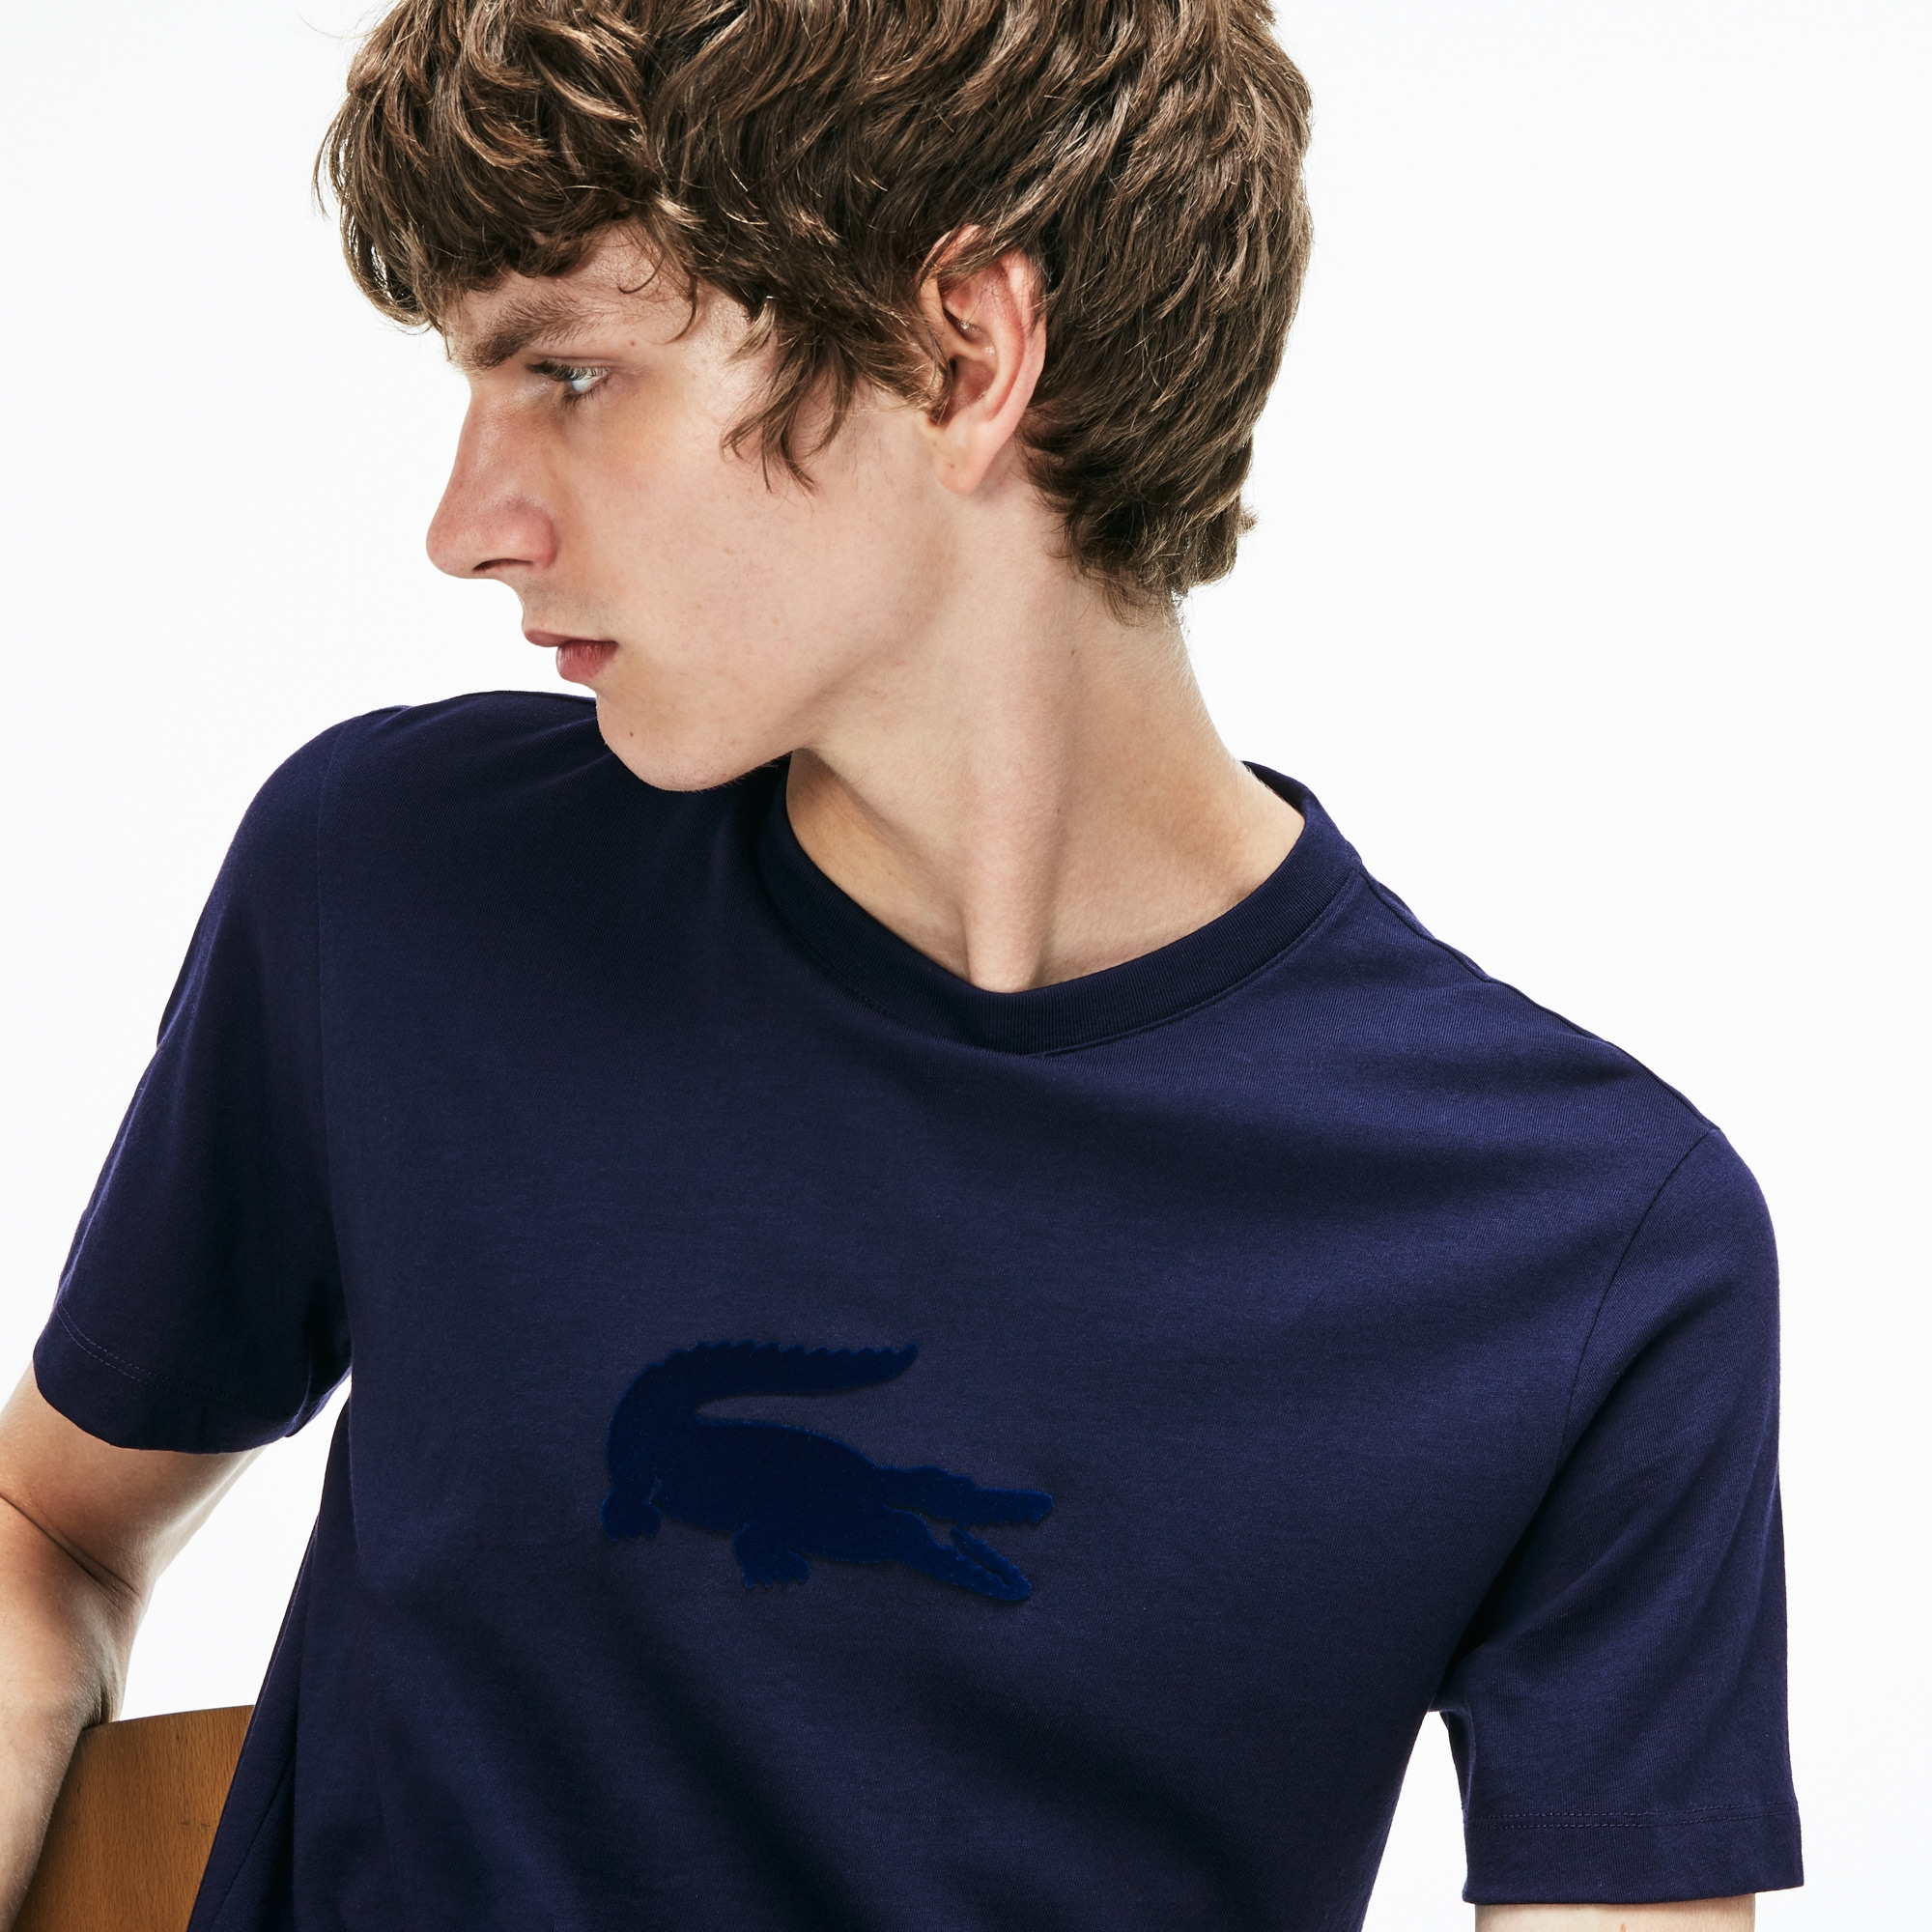 Men's Crew Neck Oversized Crocodile Jersey T-shirt